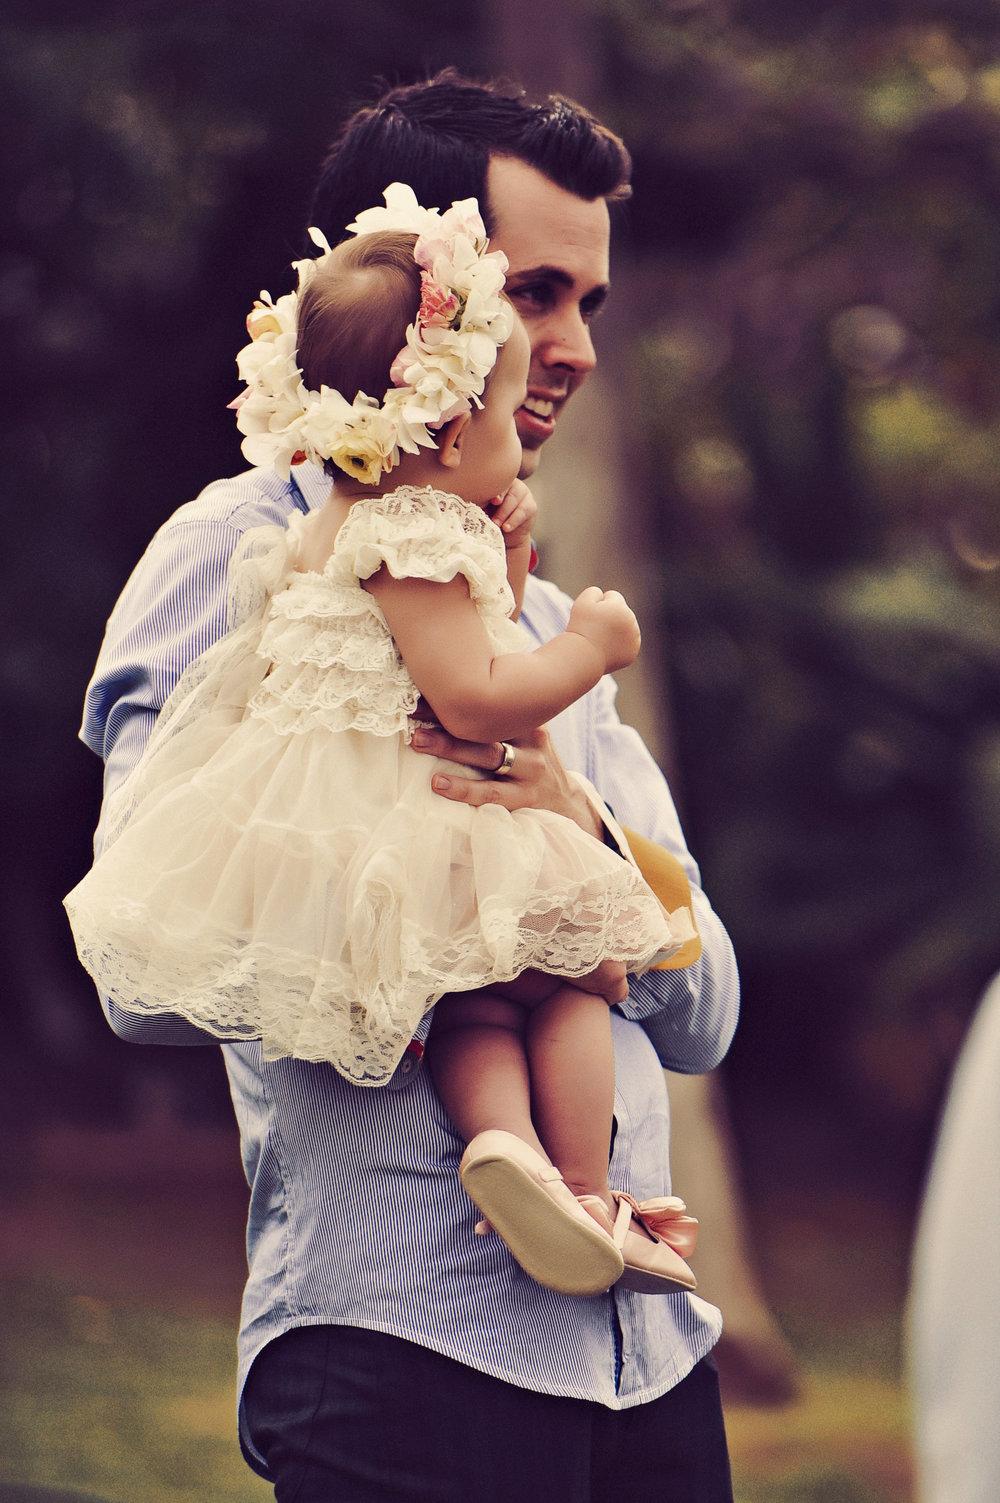 tyler_knight_aspiring_kennedy_mickelson_wedding_andaz_wailea_tamiz_photograhpy